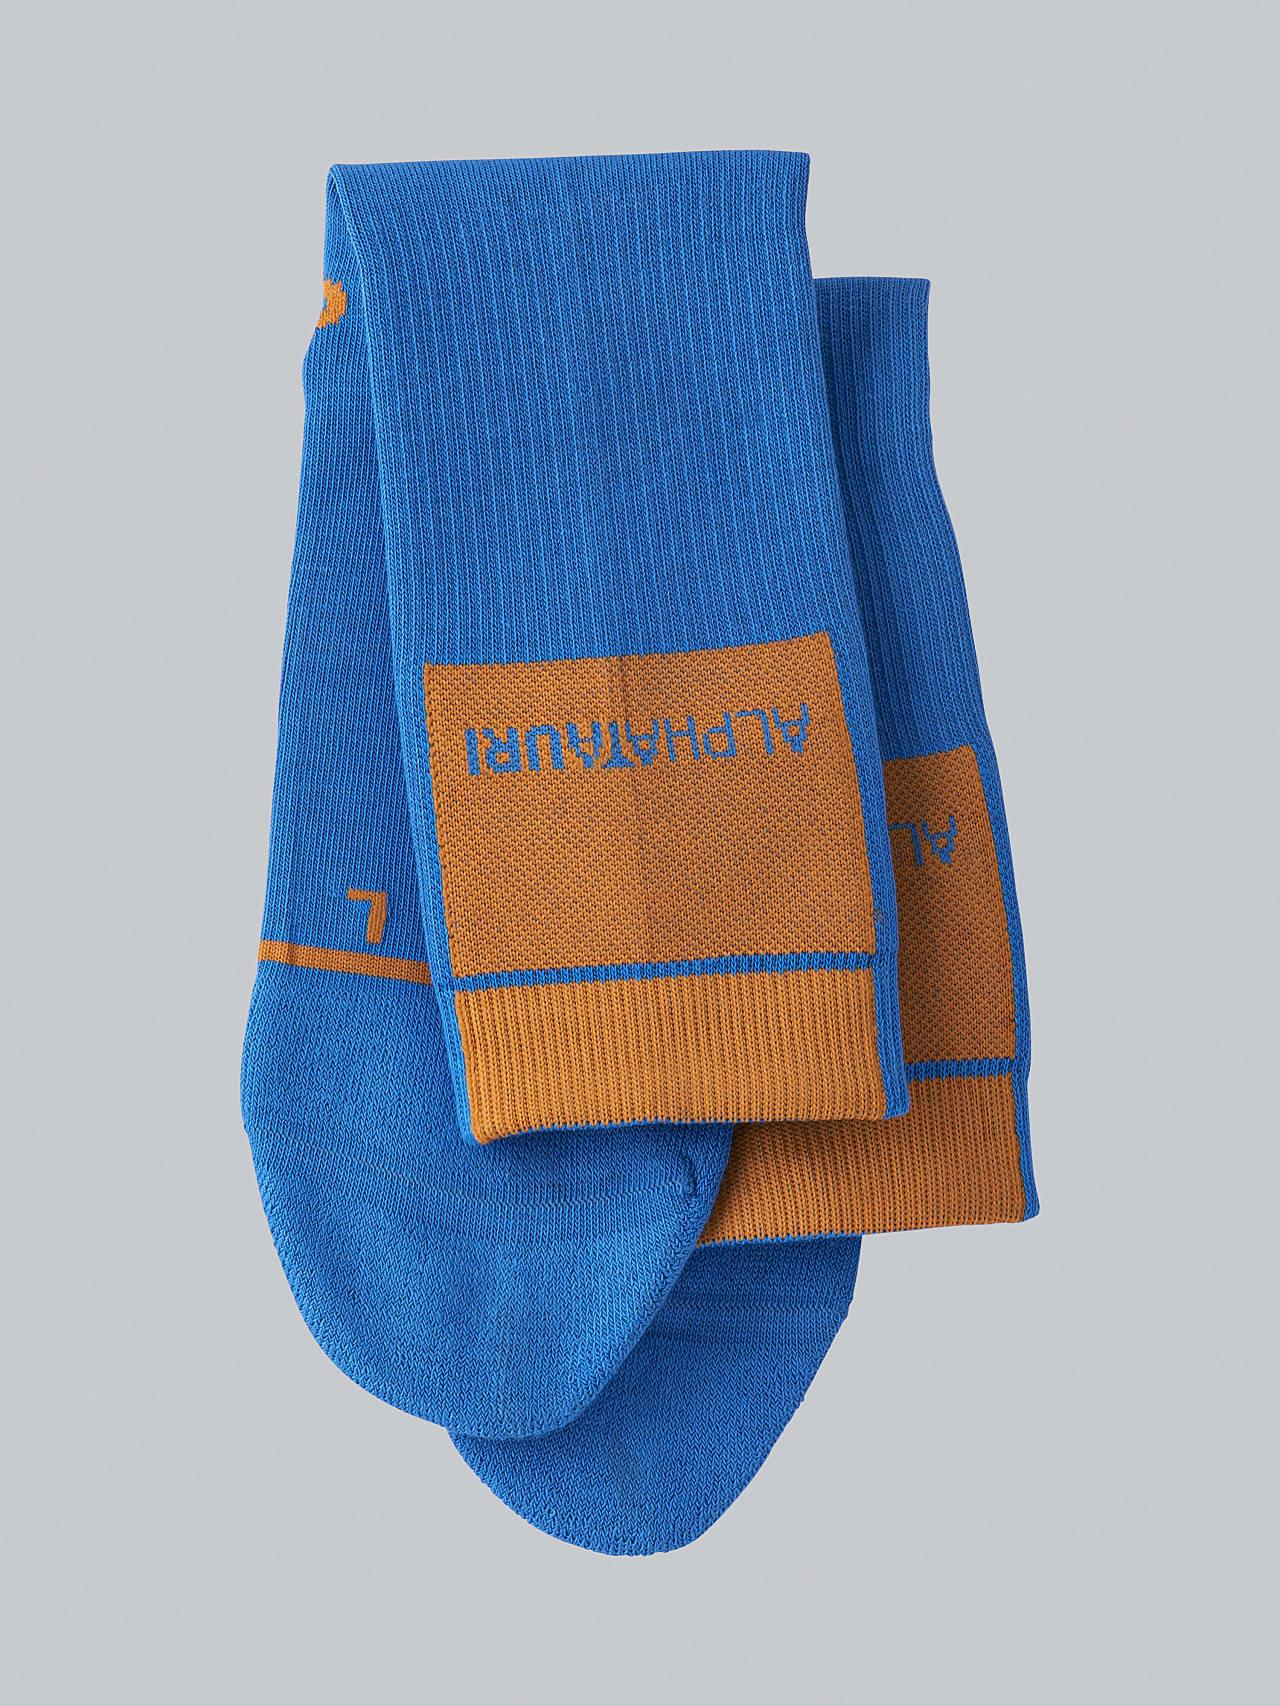 ATENI V3.Y5.02 Premium Knit Socks blue Left Alpha Tauri